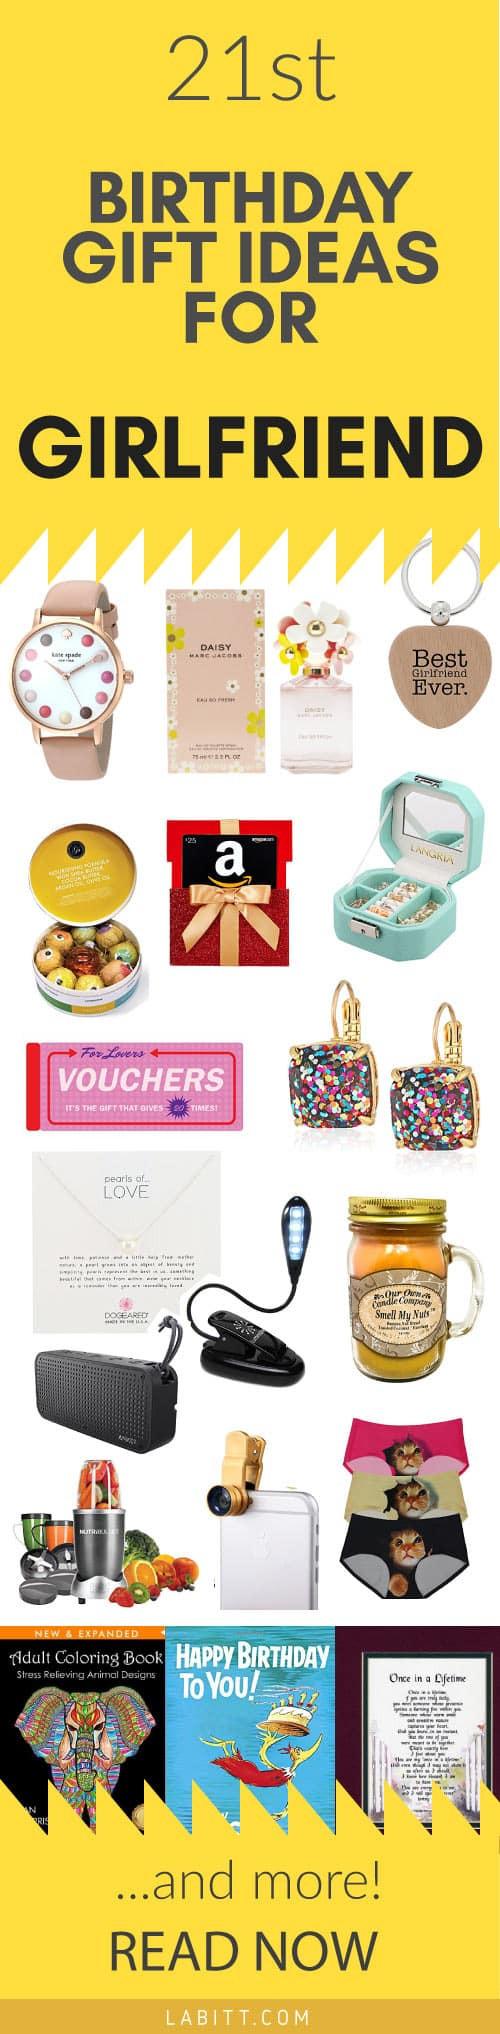 Gift Ideas Girlfriend  Creative 21st Birthday Gift Ideas for Girlfriend 21